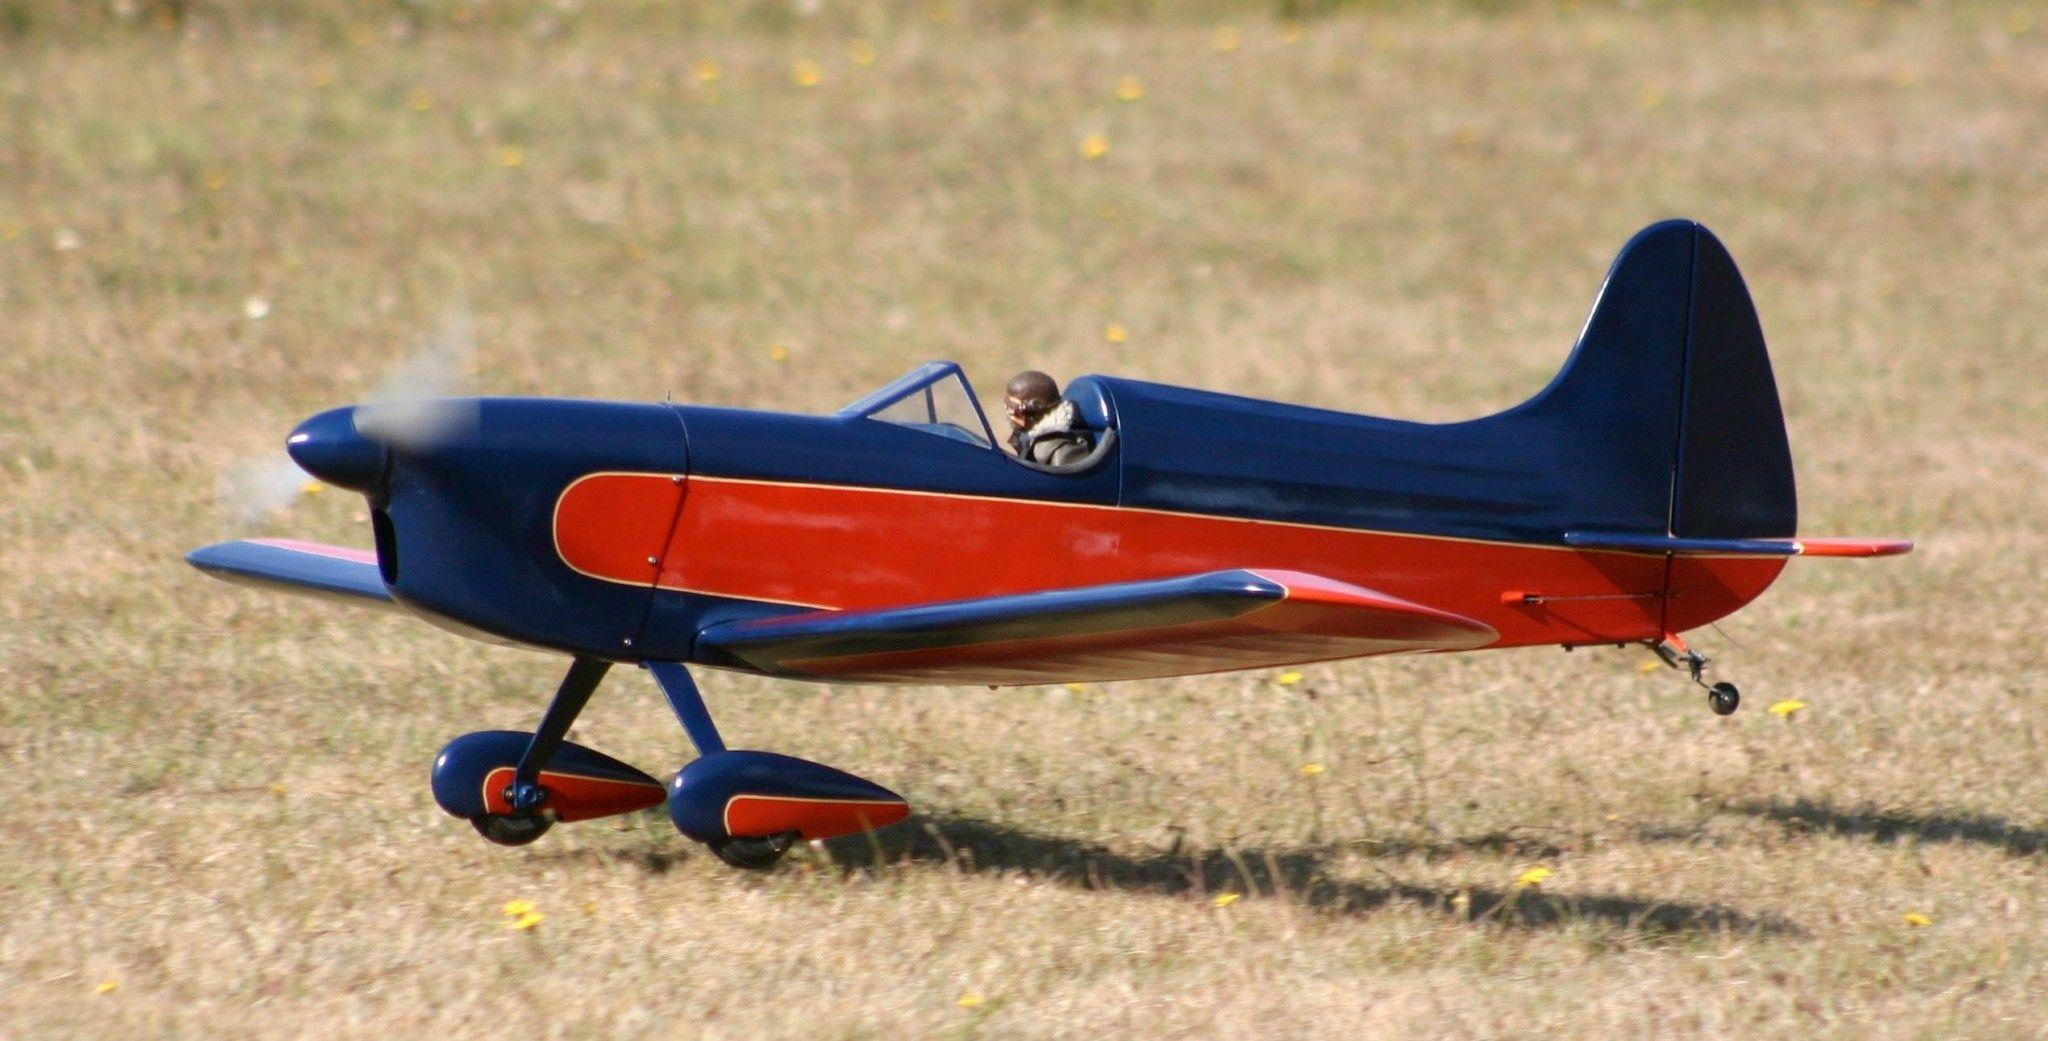 airplane R/C models sale - Google Search | Radio control